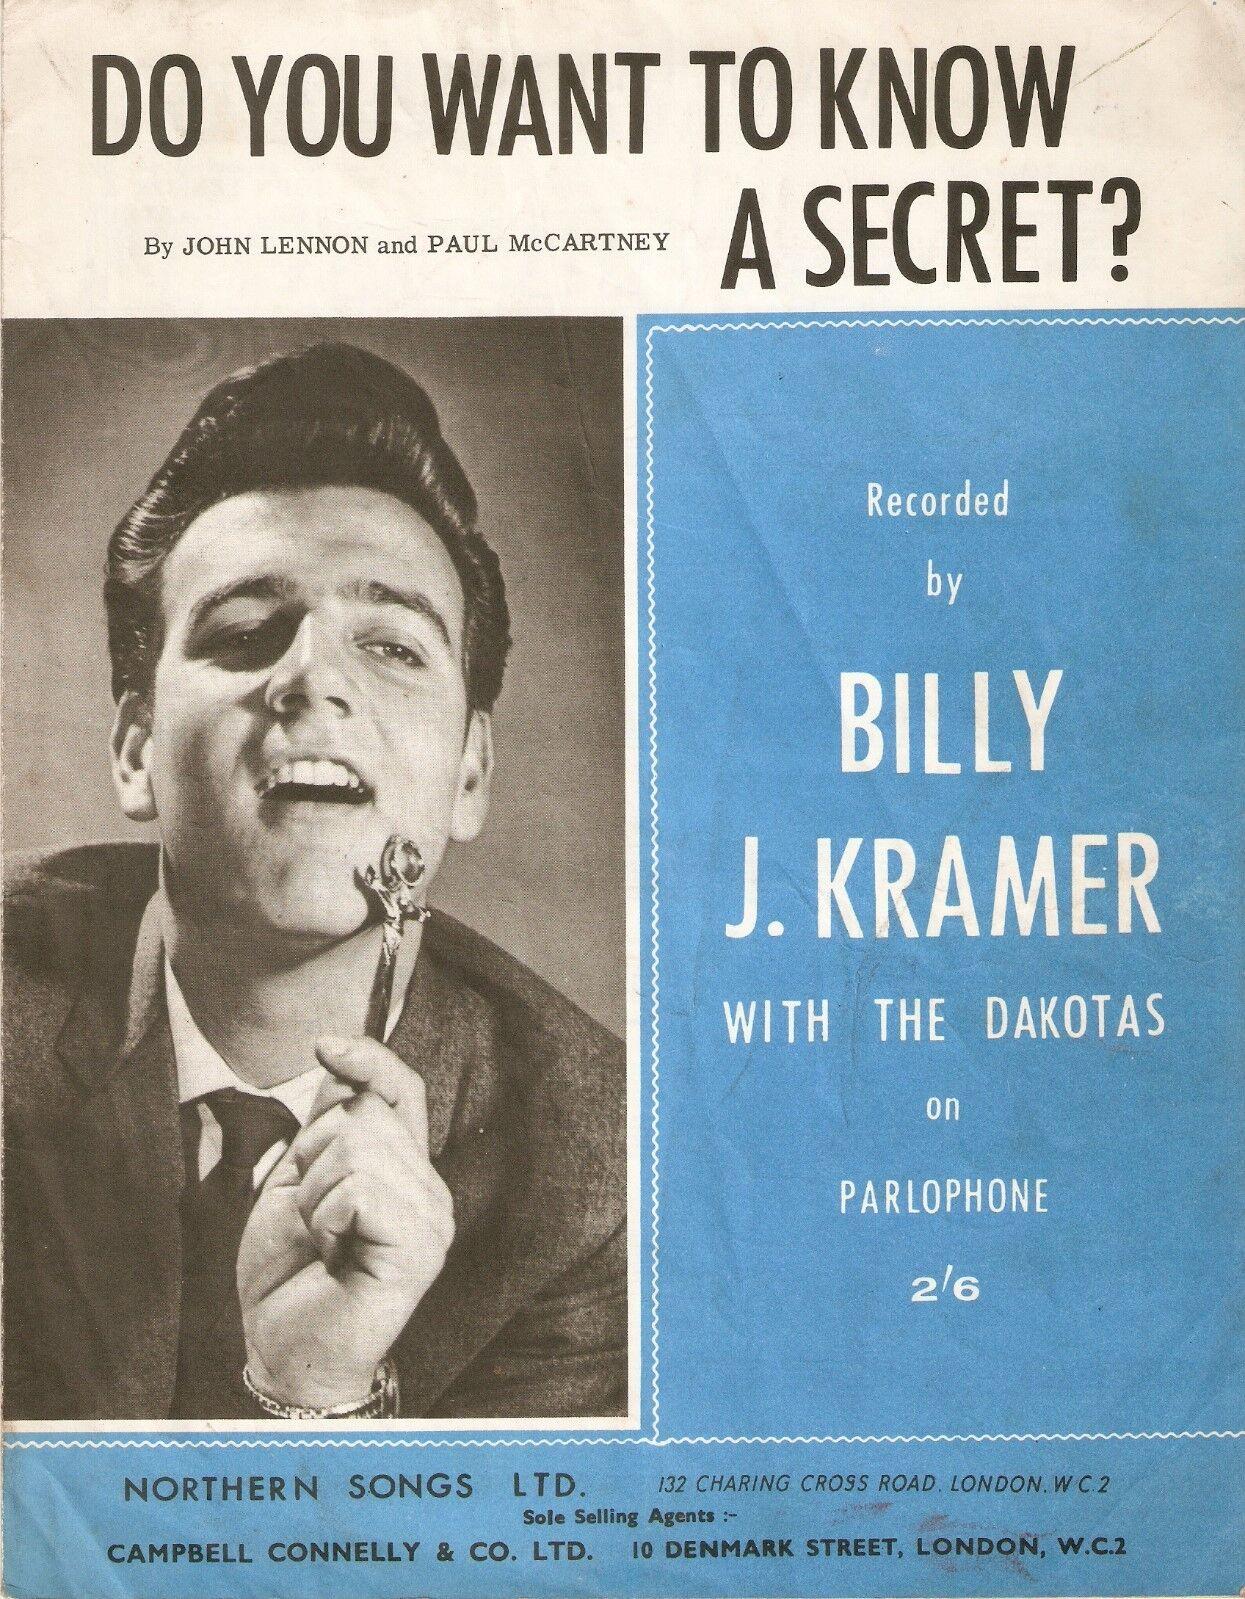 Image 1 - SHEET-MUSIC-BILLY-J-KRAMER-amp-DAKOTAS-DO-YOU-WANT-TO-KNOW-A-SECRET-1963-BEATLES